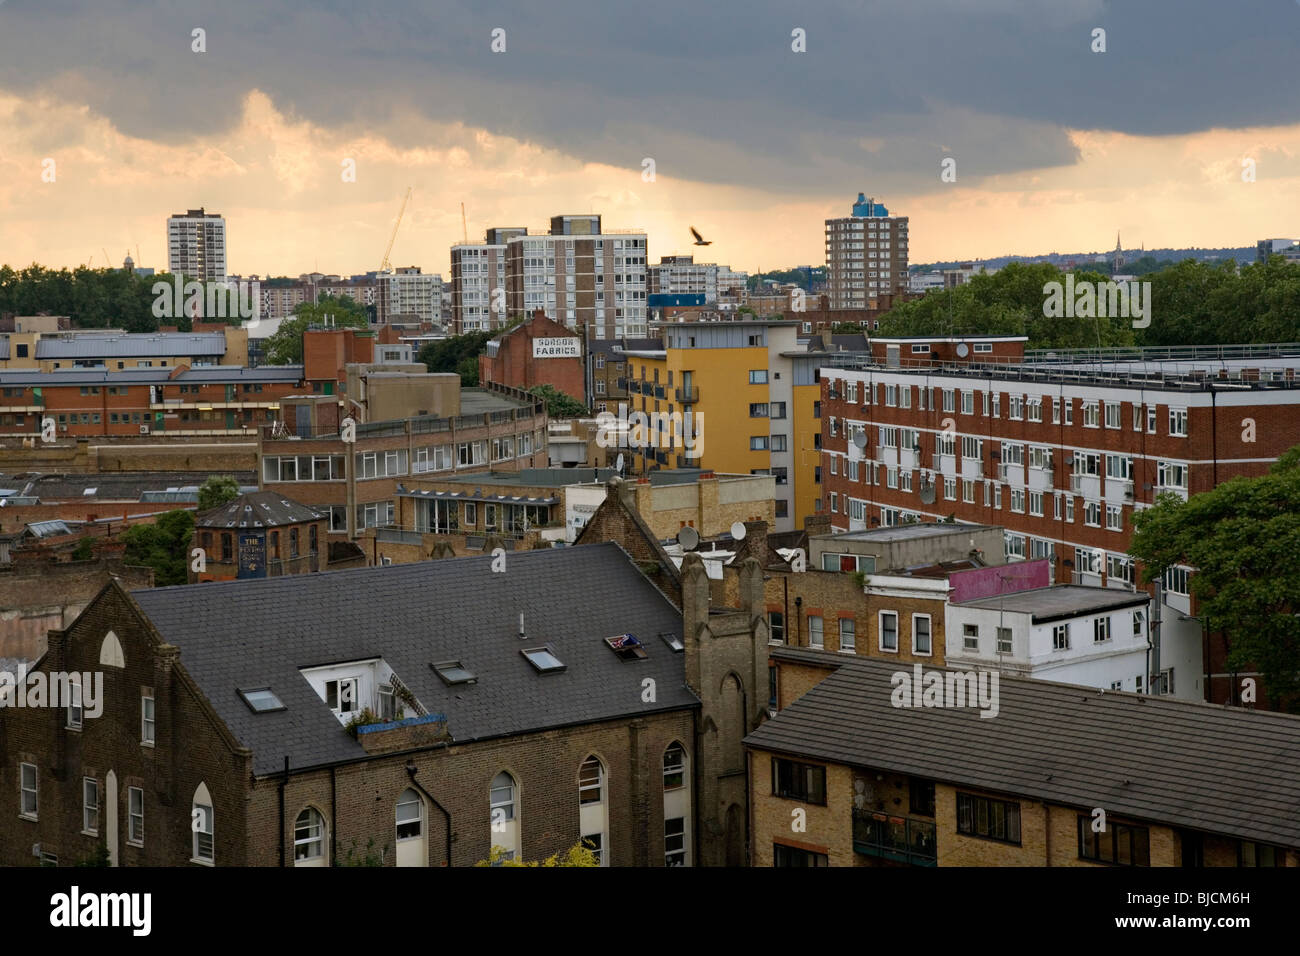 East London Skyline Photo Stock